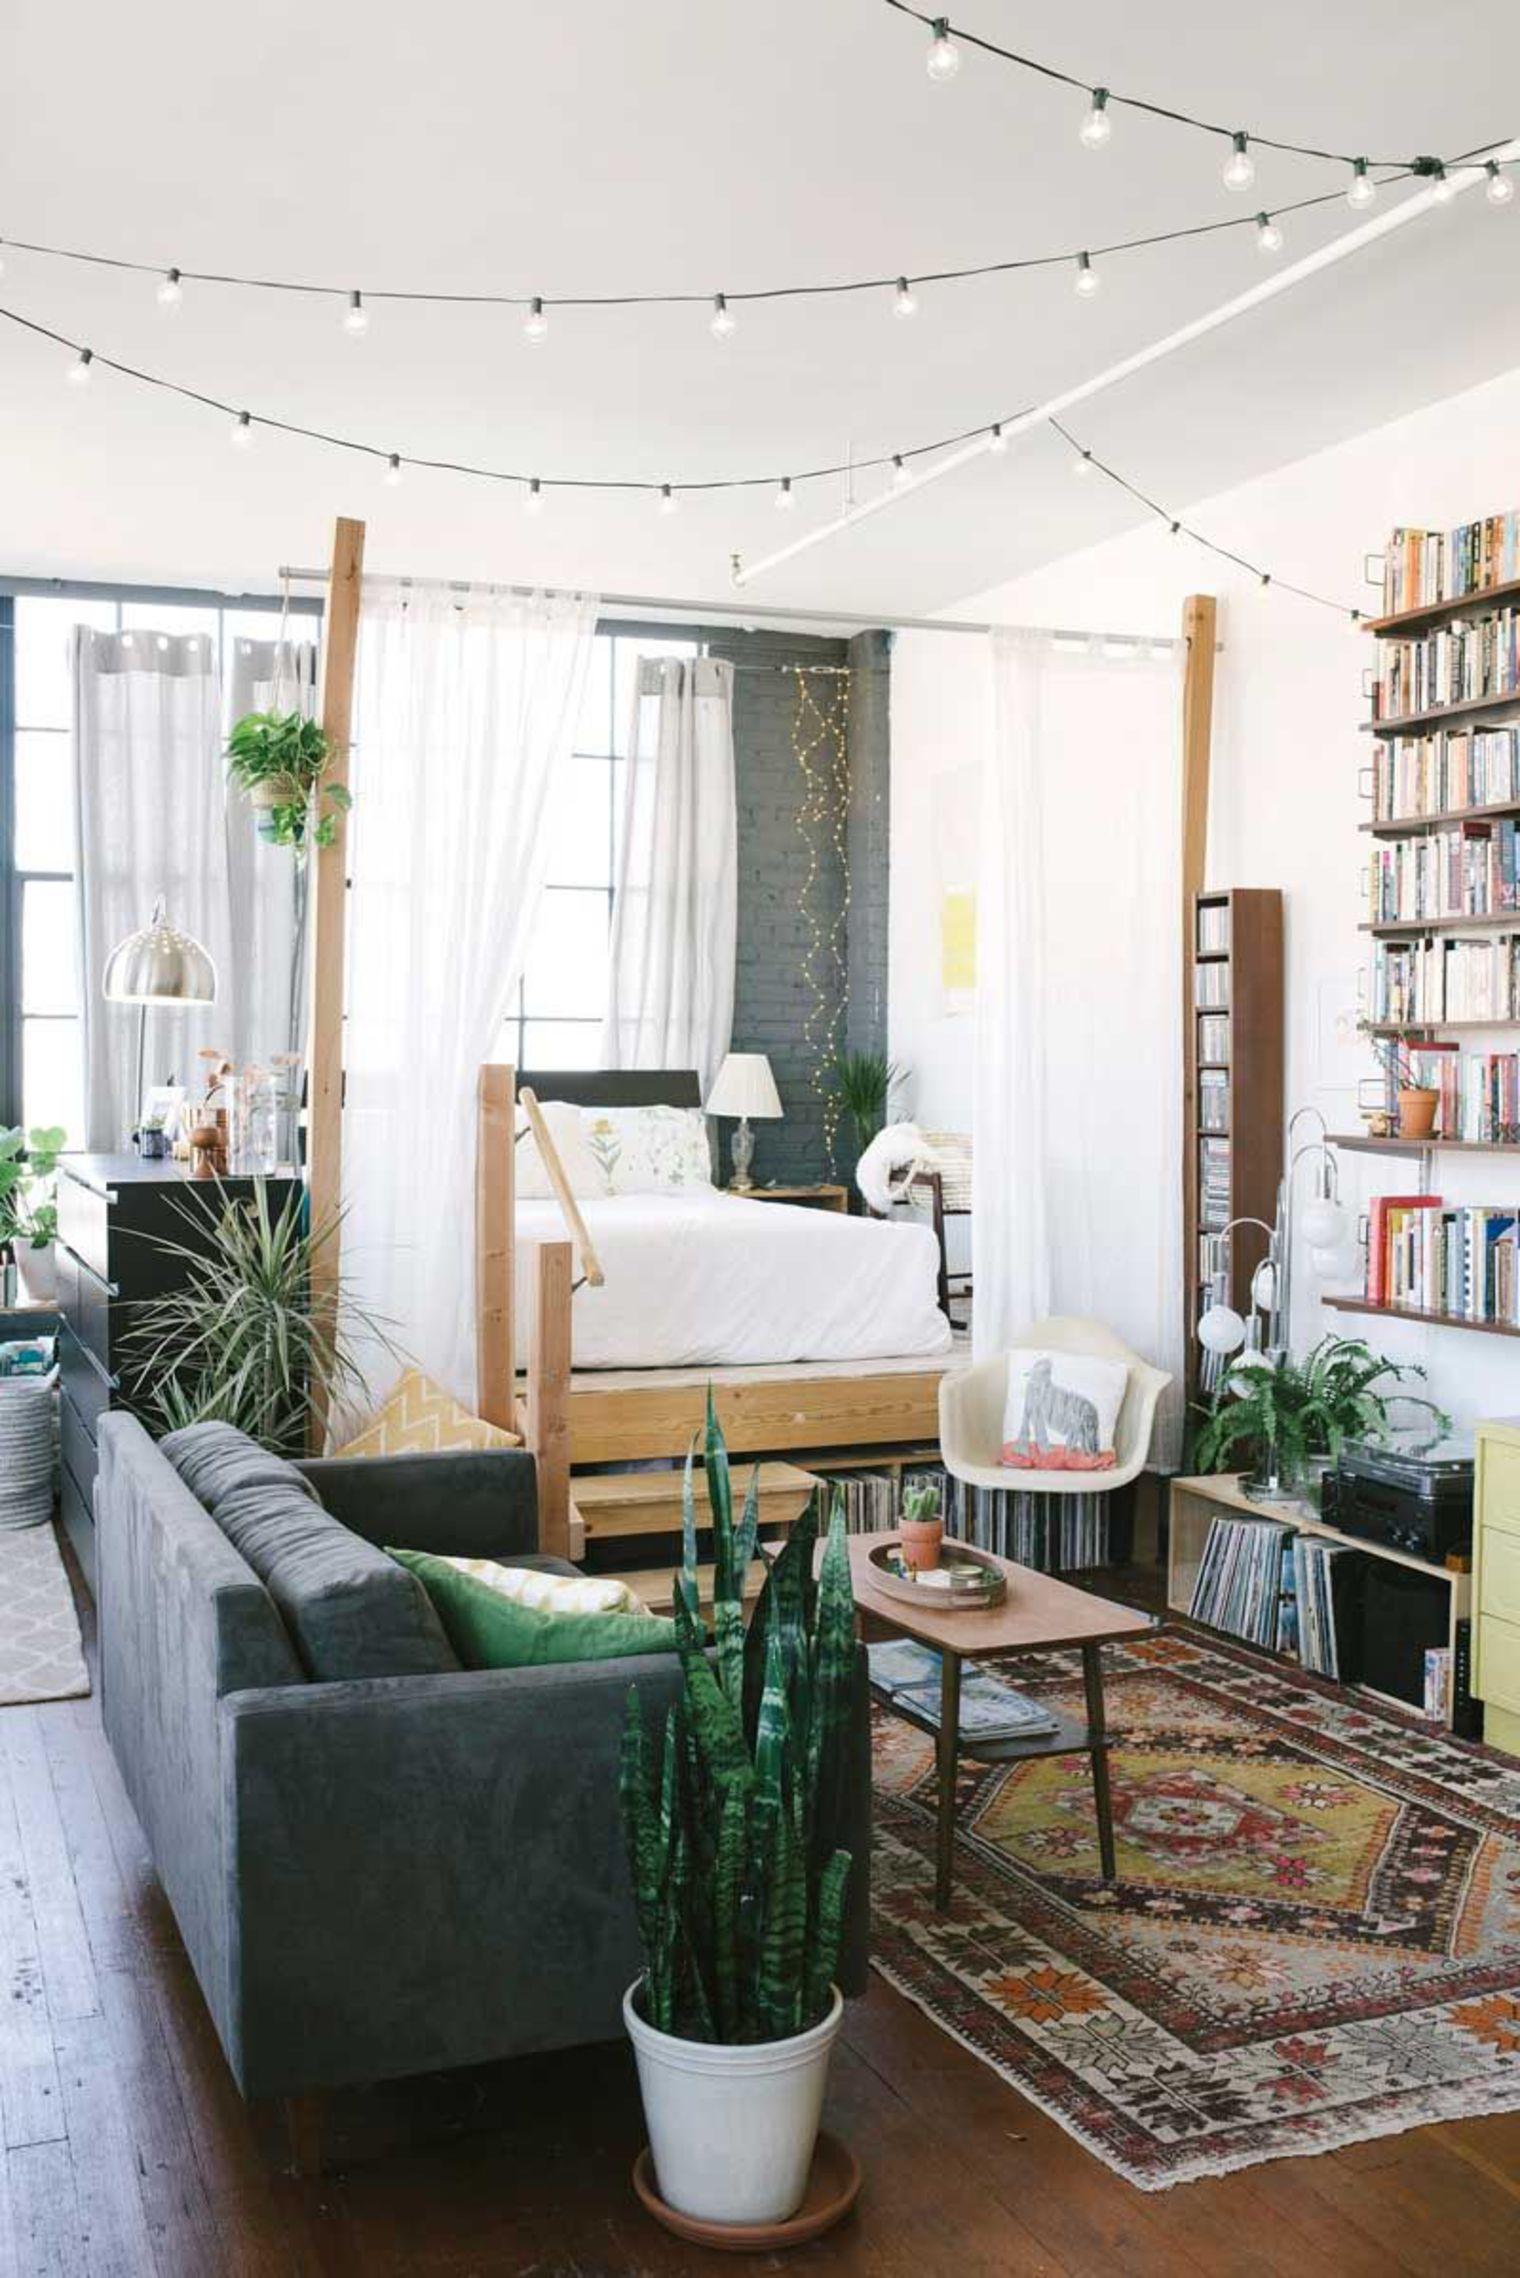 separate bedroom in a studio apartment